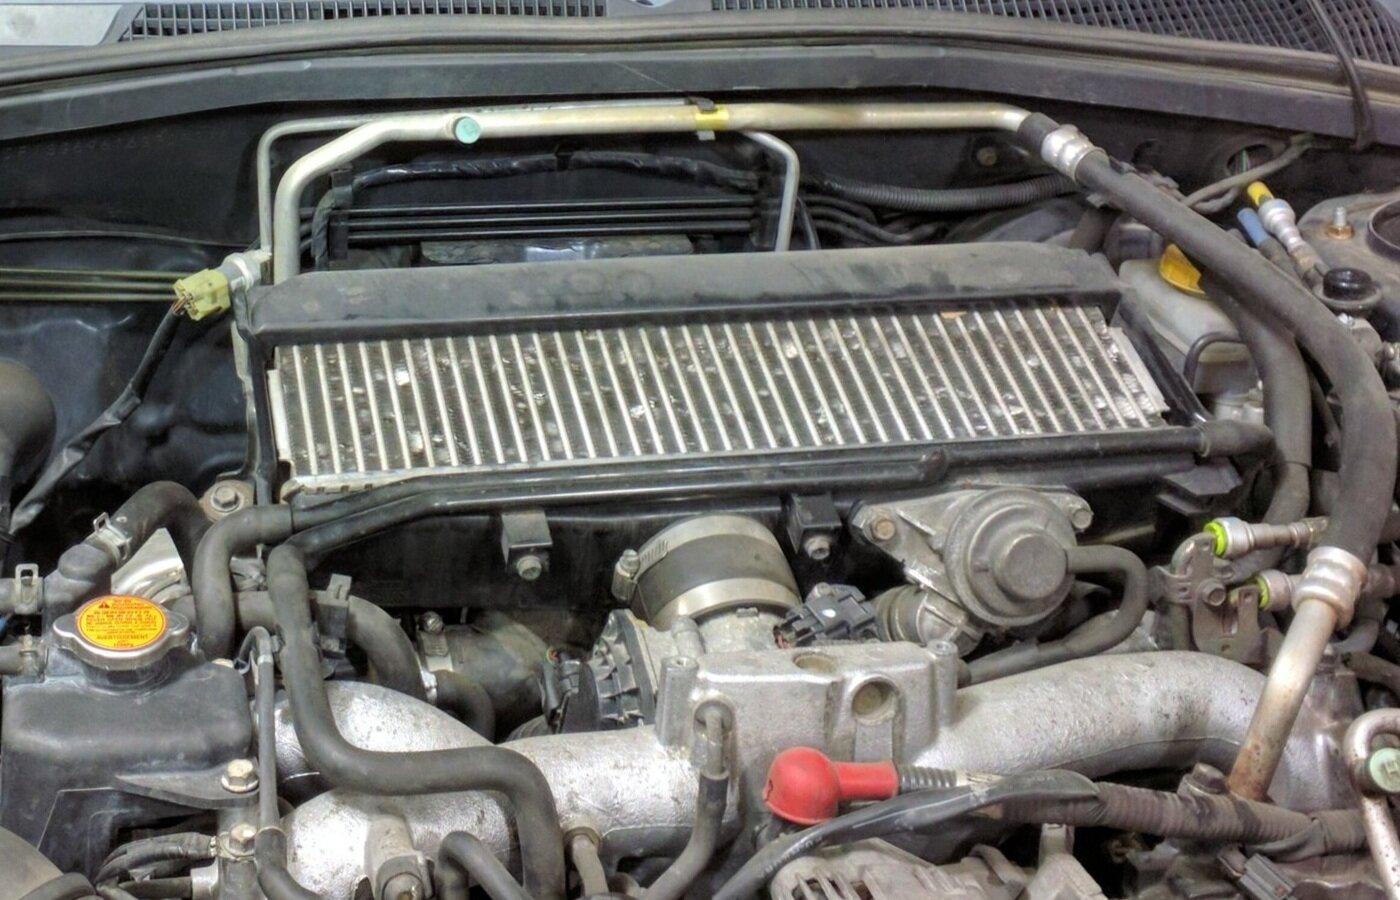 GrimmSpeed Top Mount Intercooler Splitter For Subaru 04-08 Forester XT